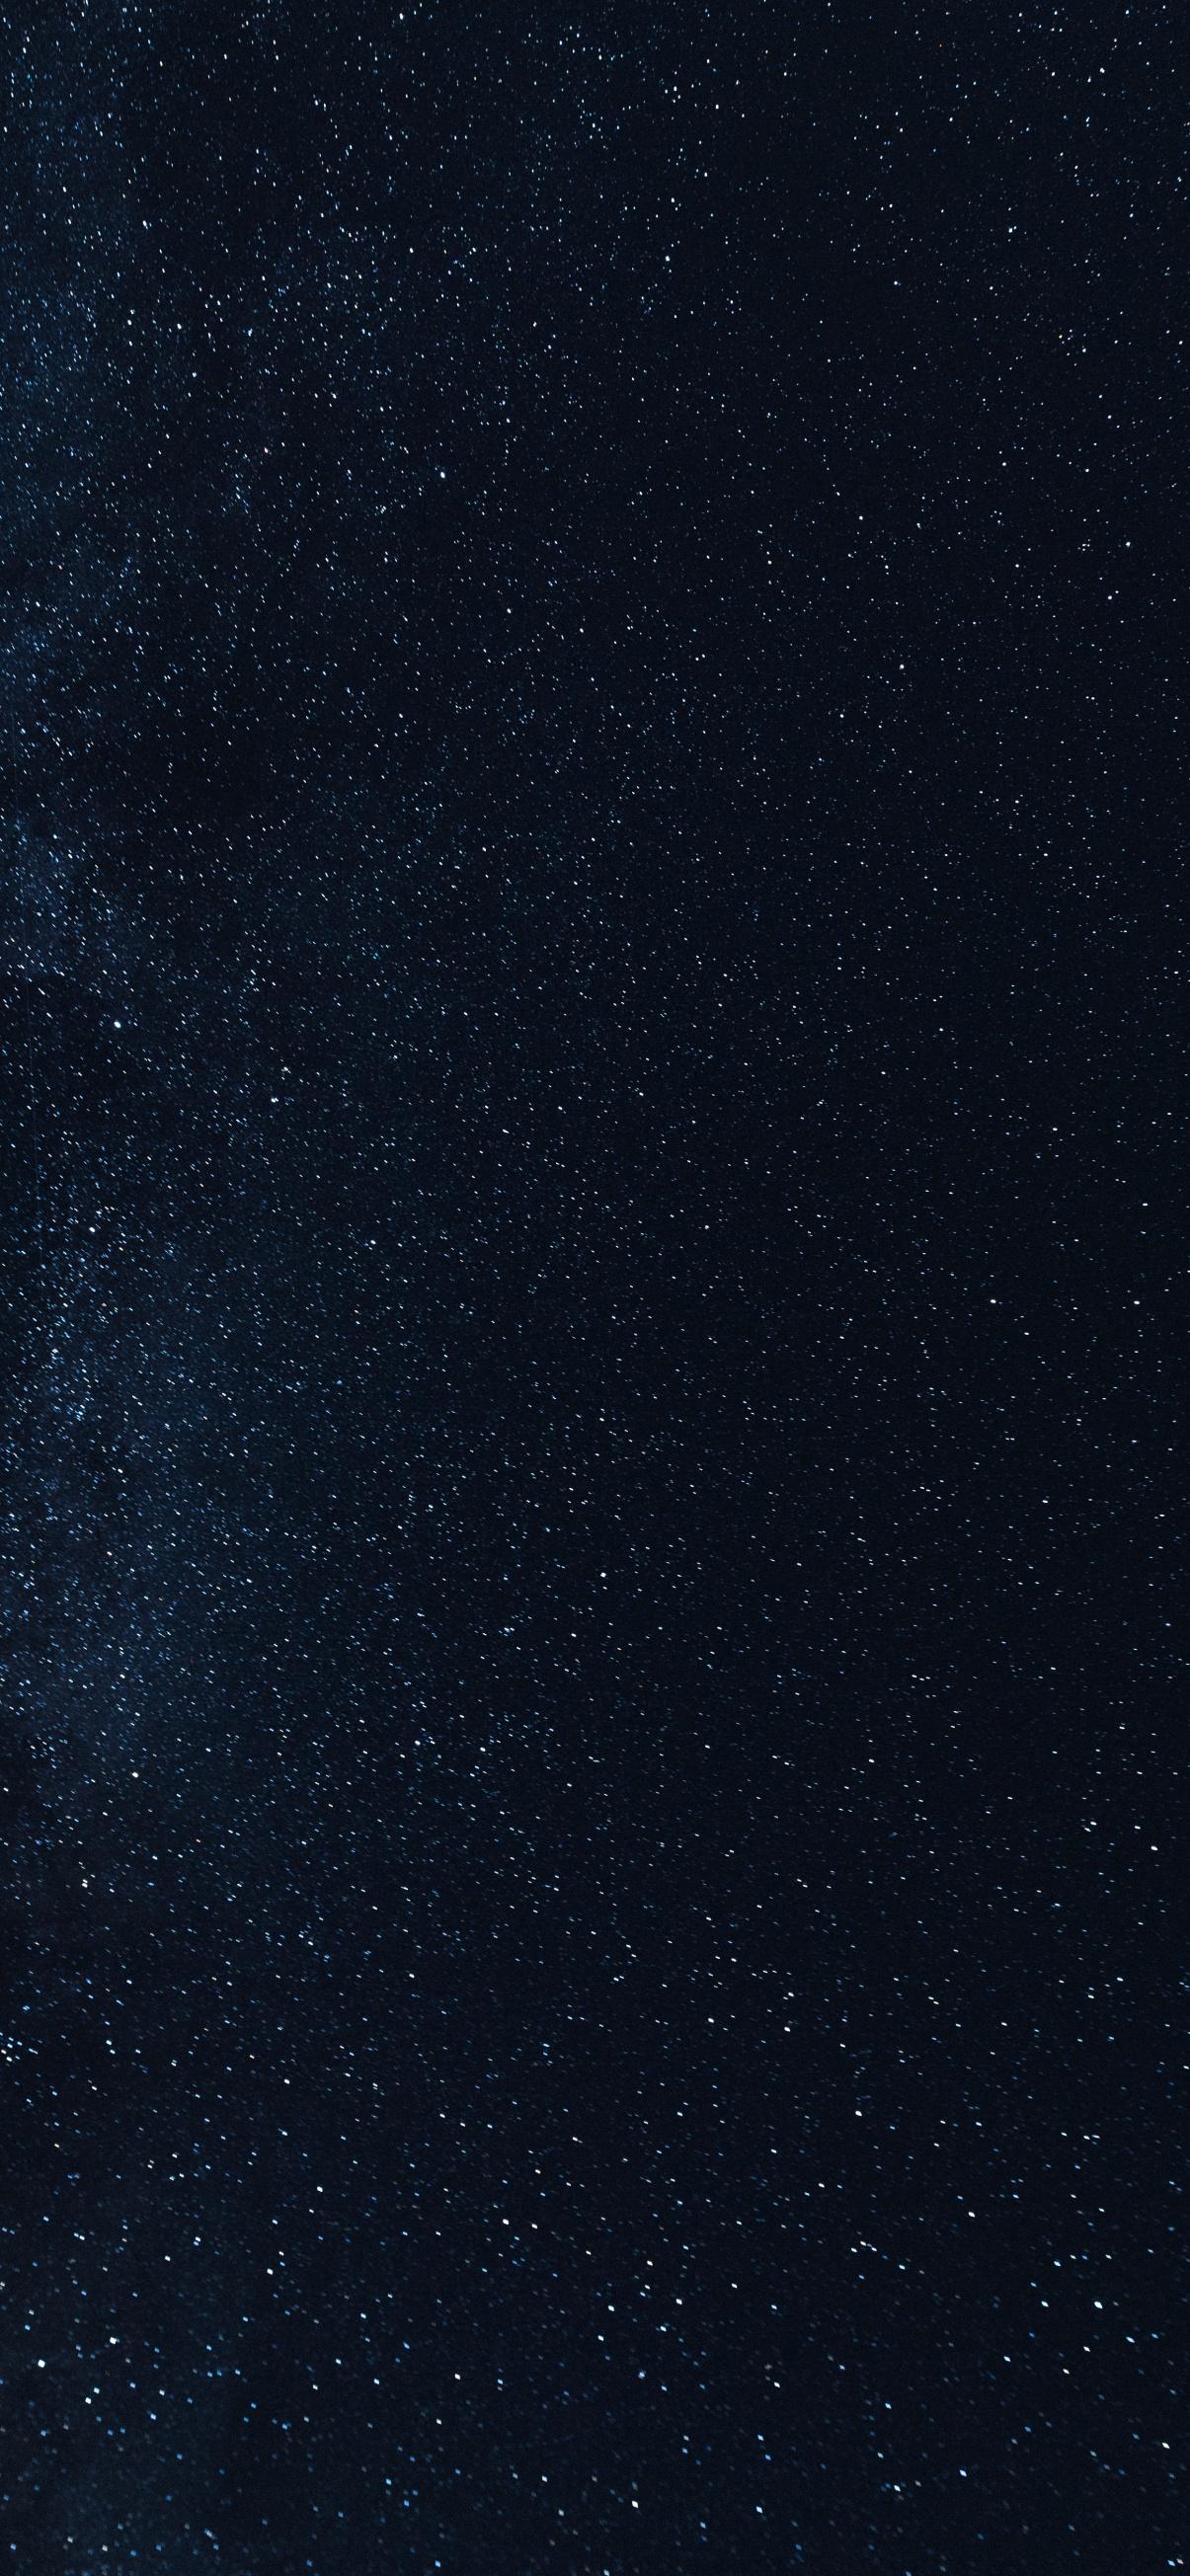 night sky galaxy wallpaper for iphone hd